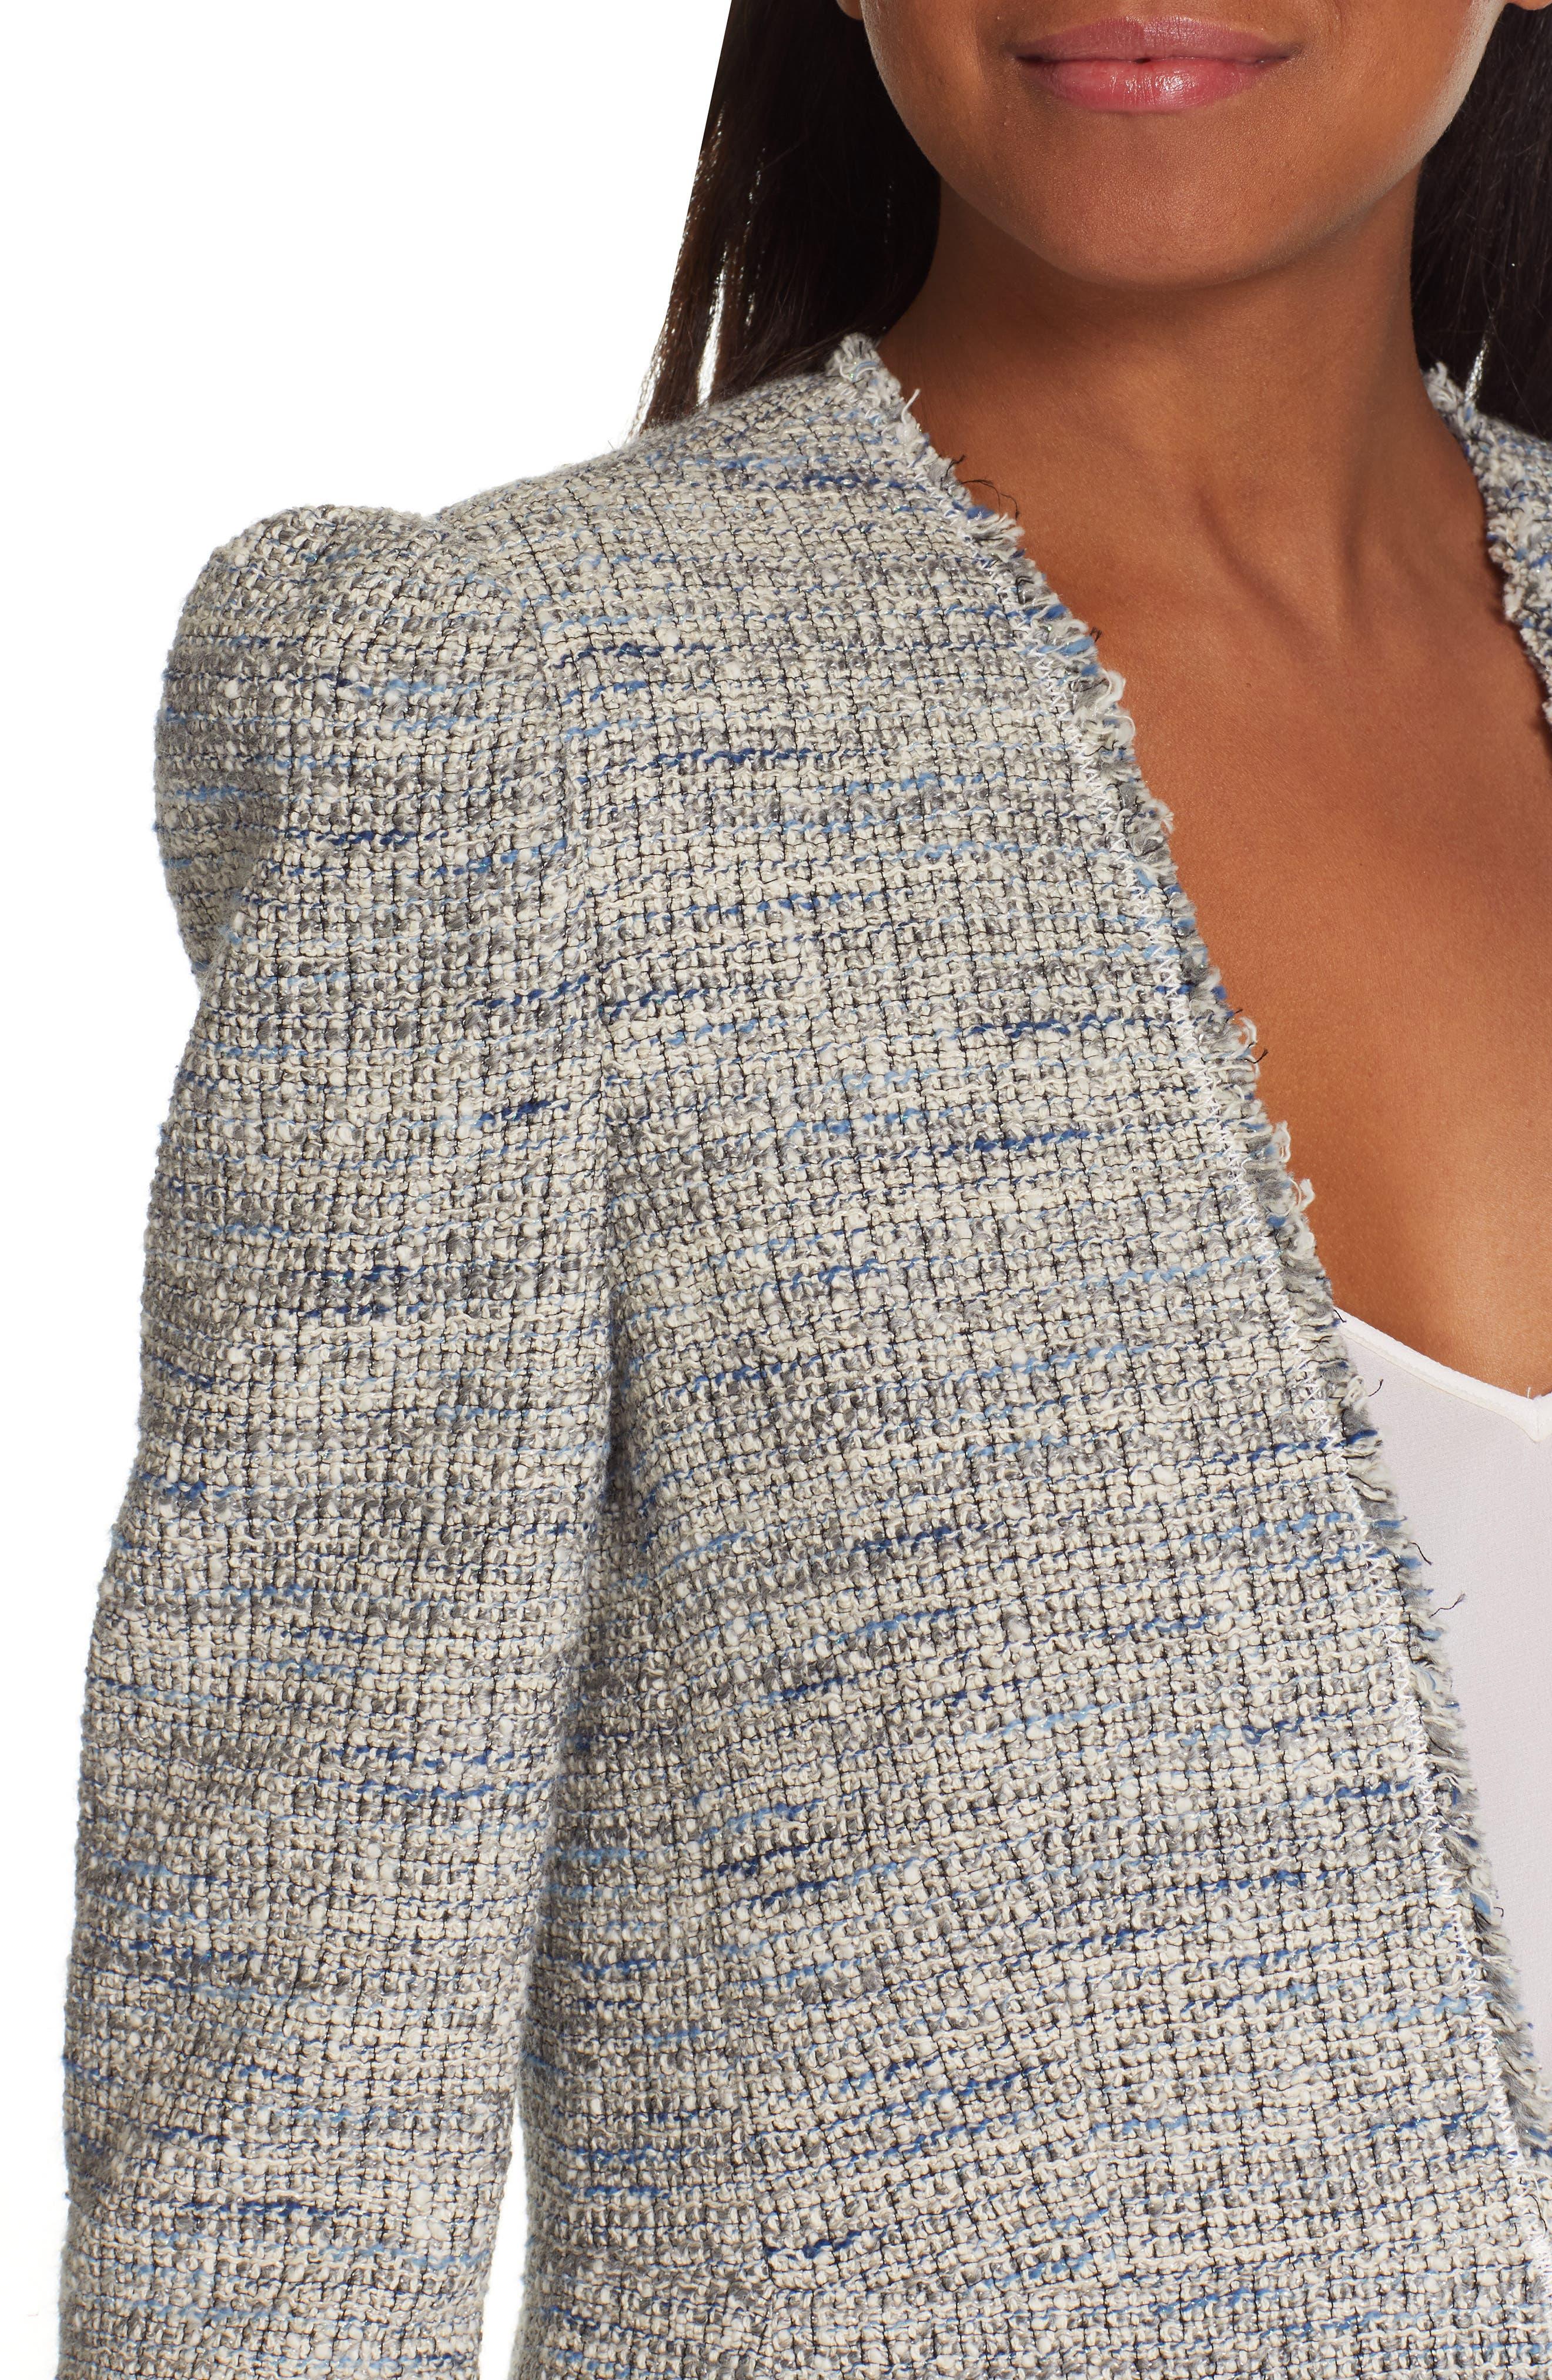 REBECCA TAYLOR, Tweed Peplum Jacket, Alternate thumbnail 5, color, BLUE/ GREY COMBO